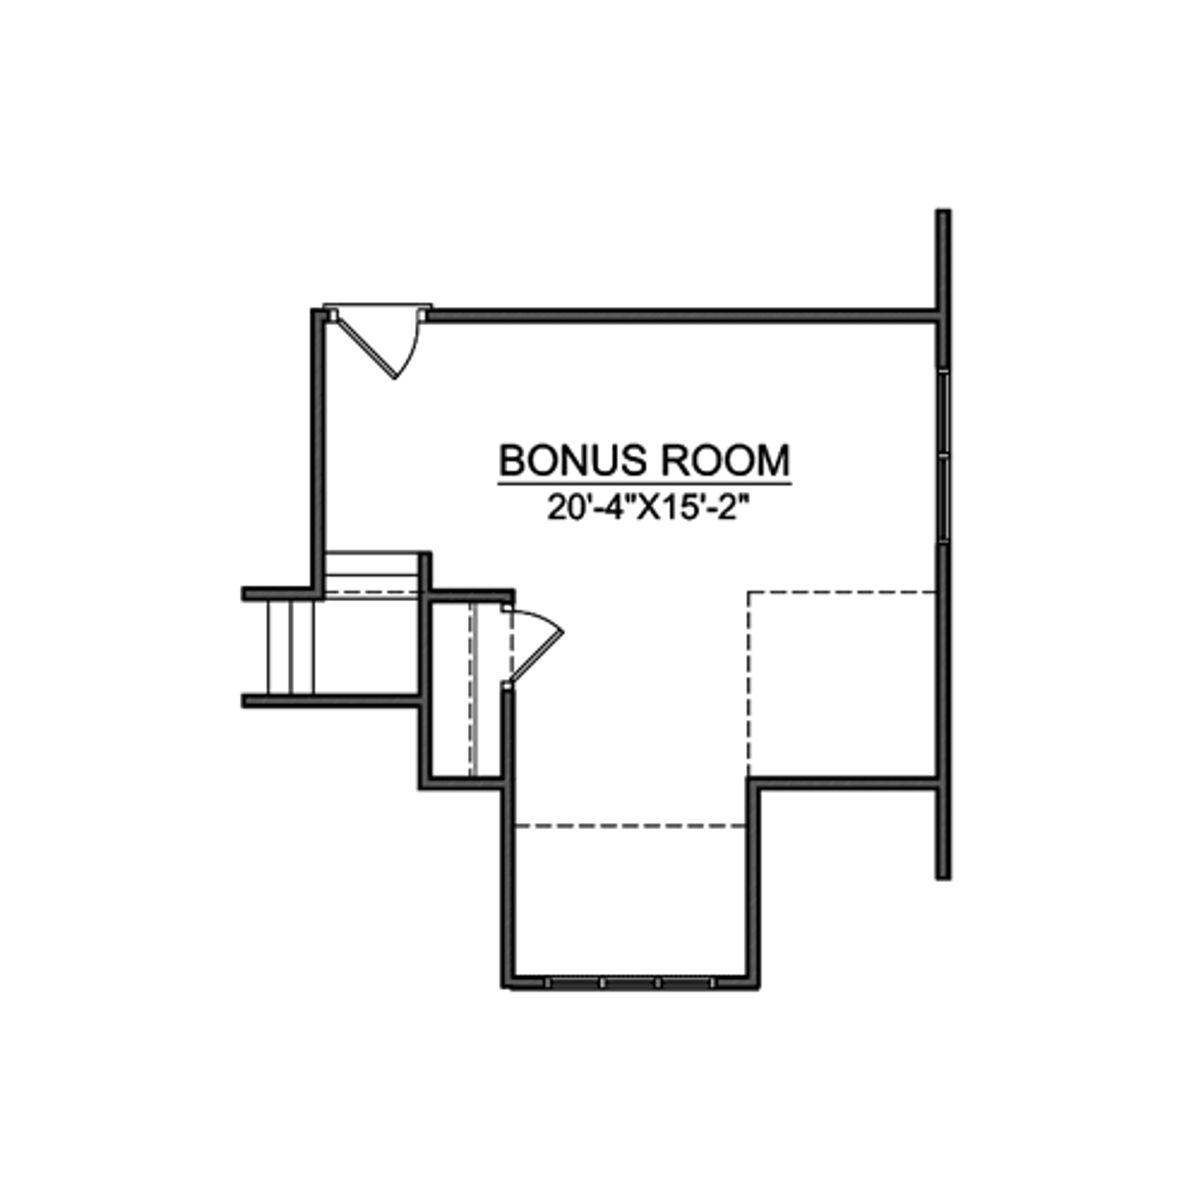 The Lanai Bonus Room at River Oaks